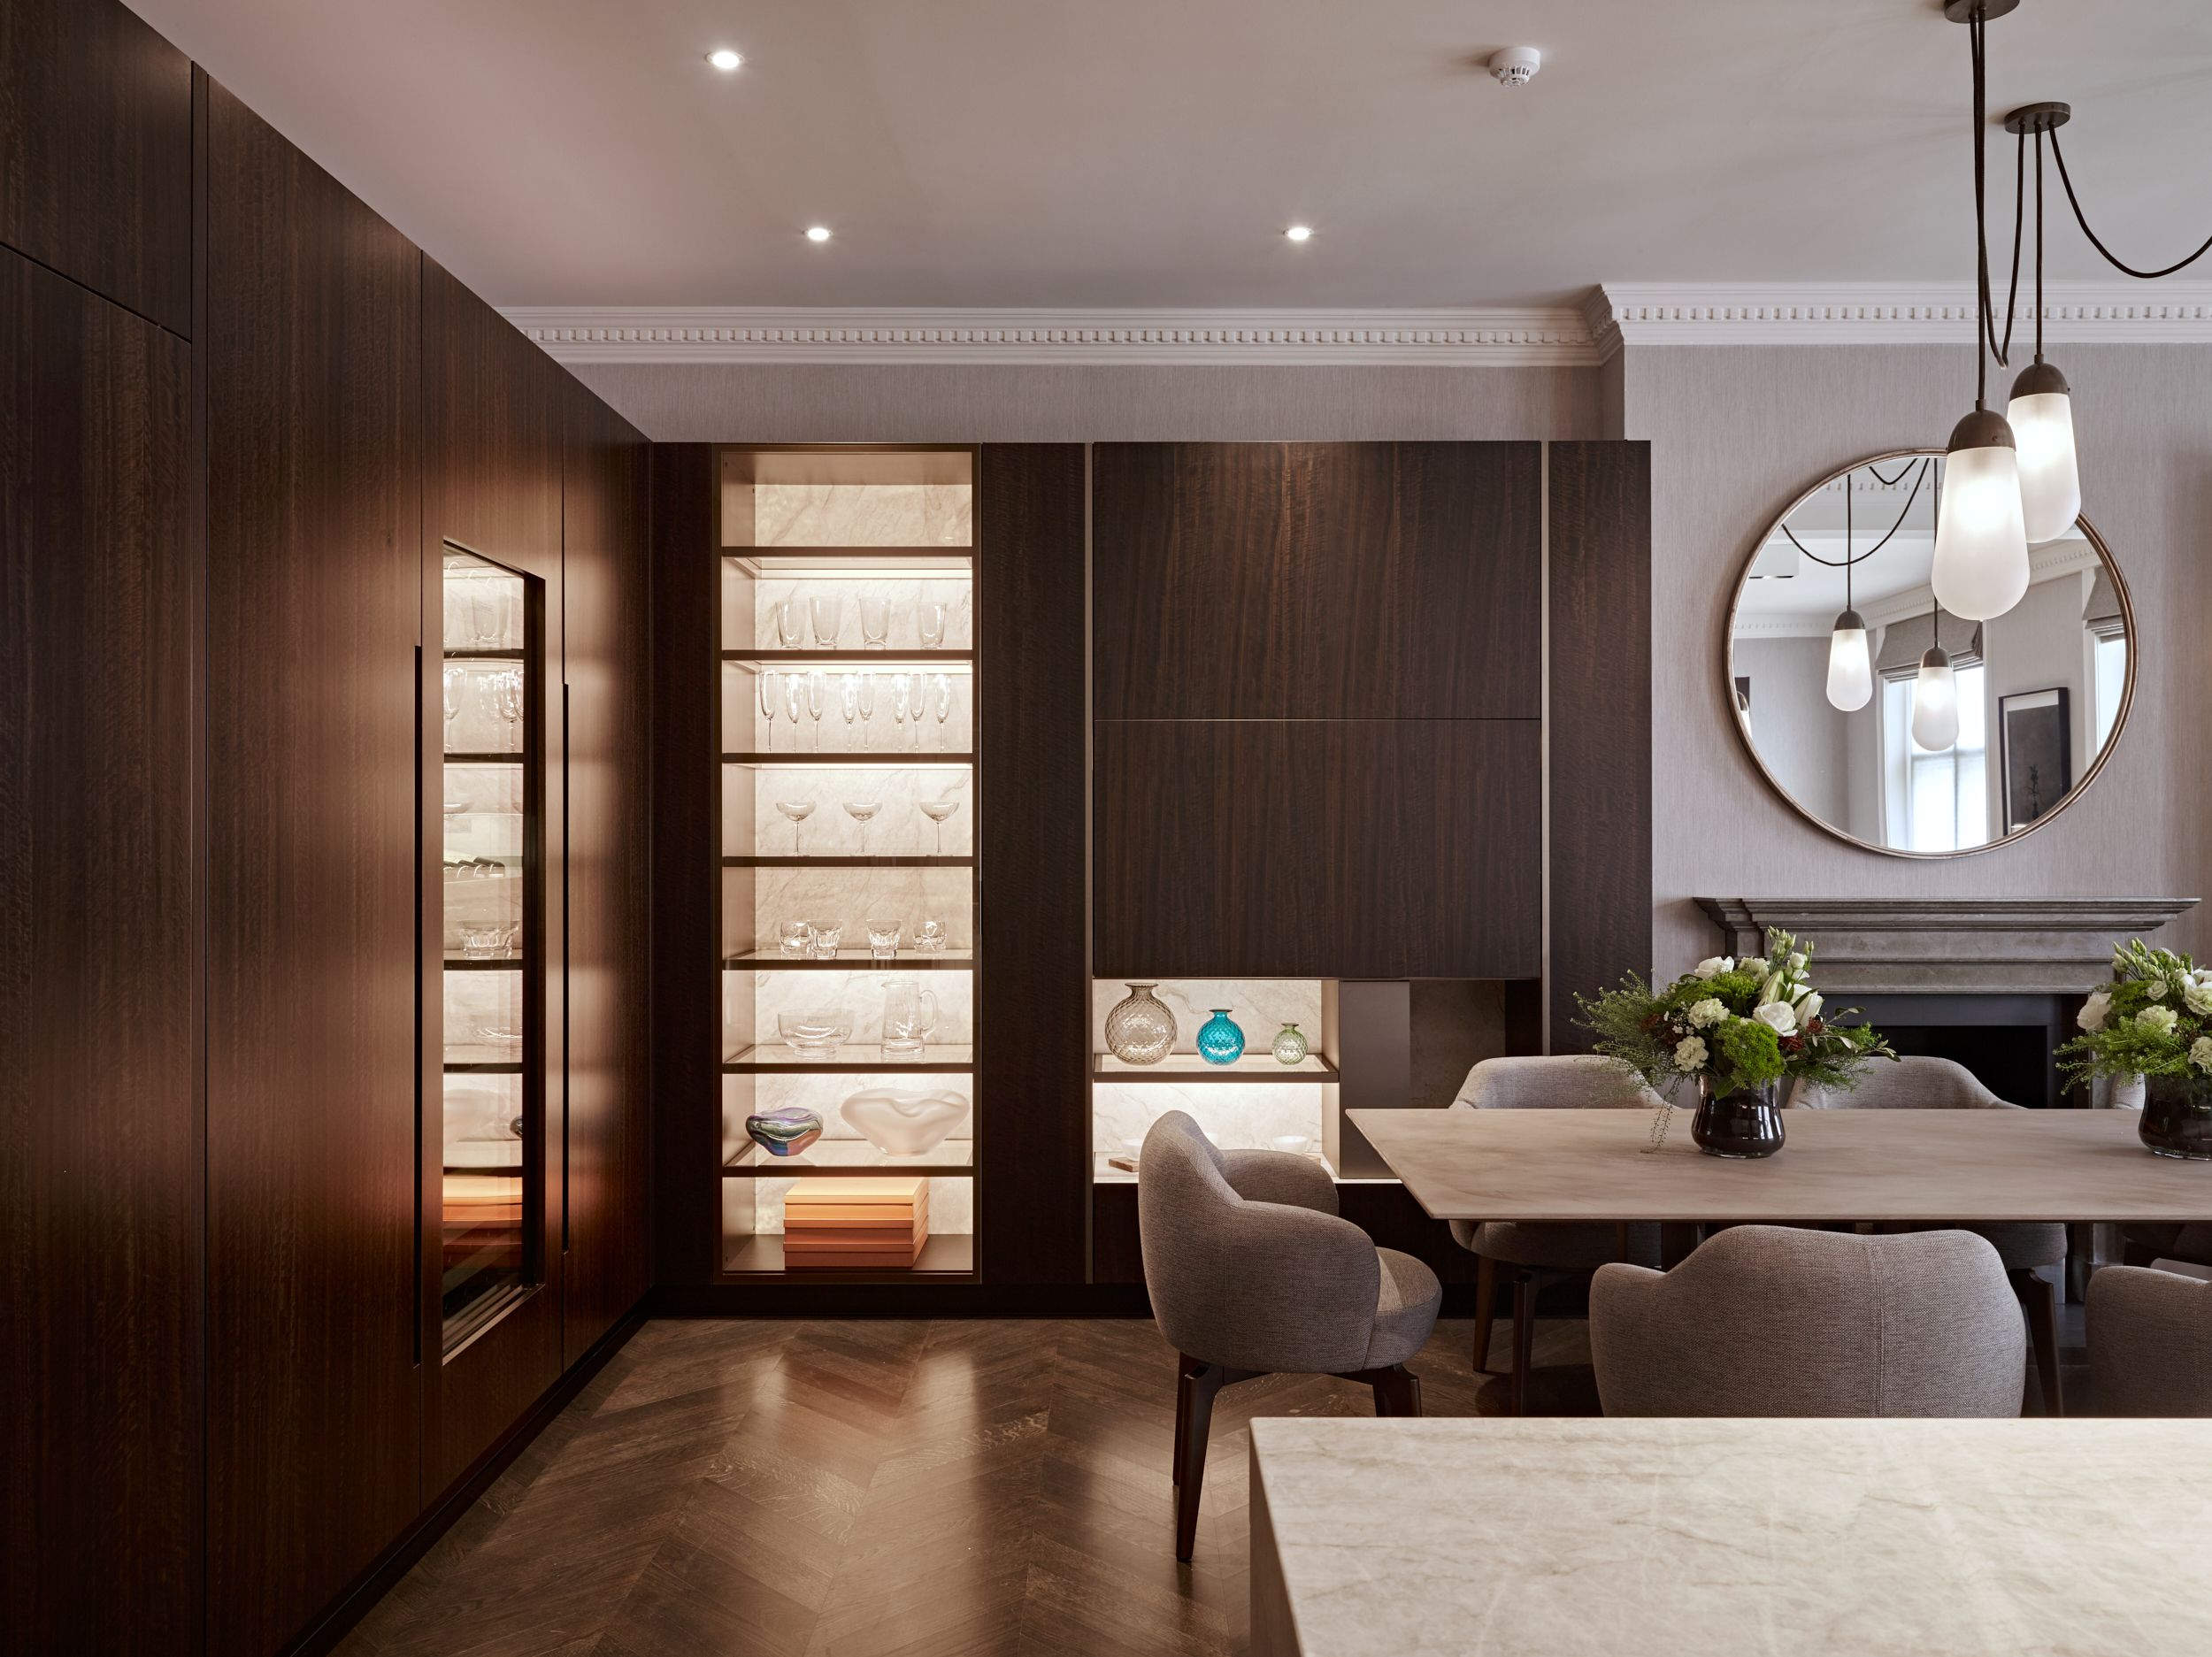 Eggersmann Design Smoked Eucalyptus Veneered Cabinetry Designer